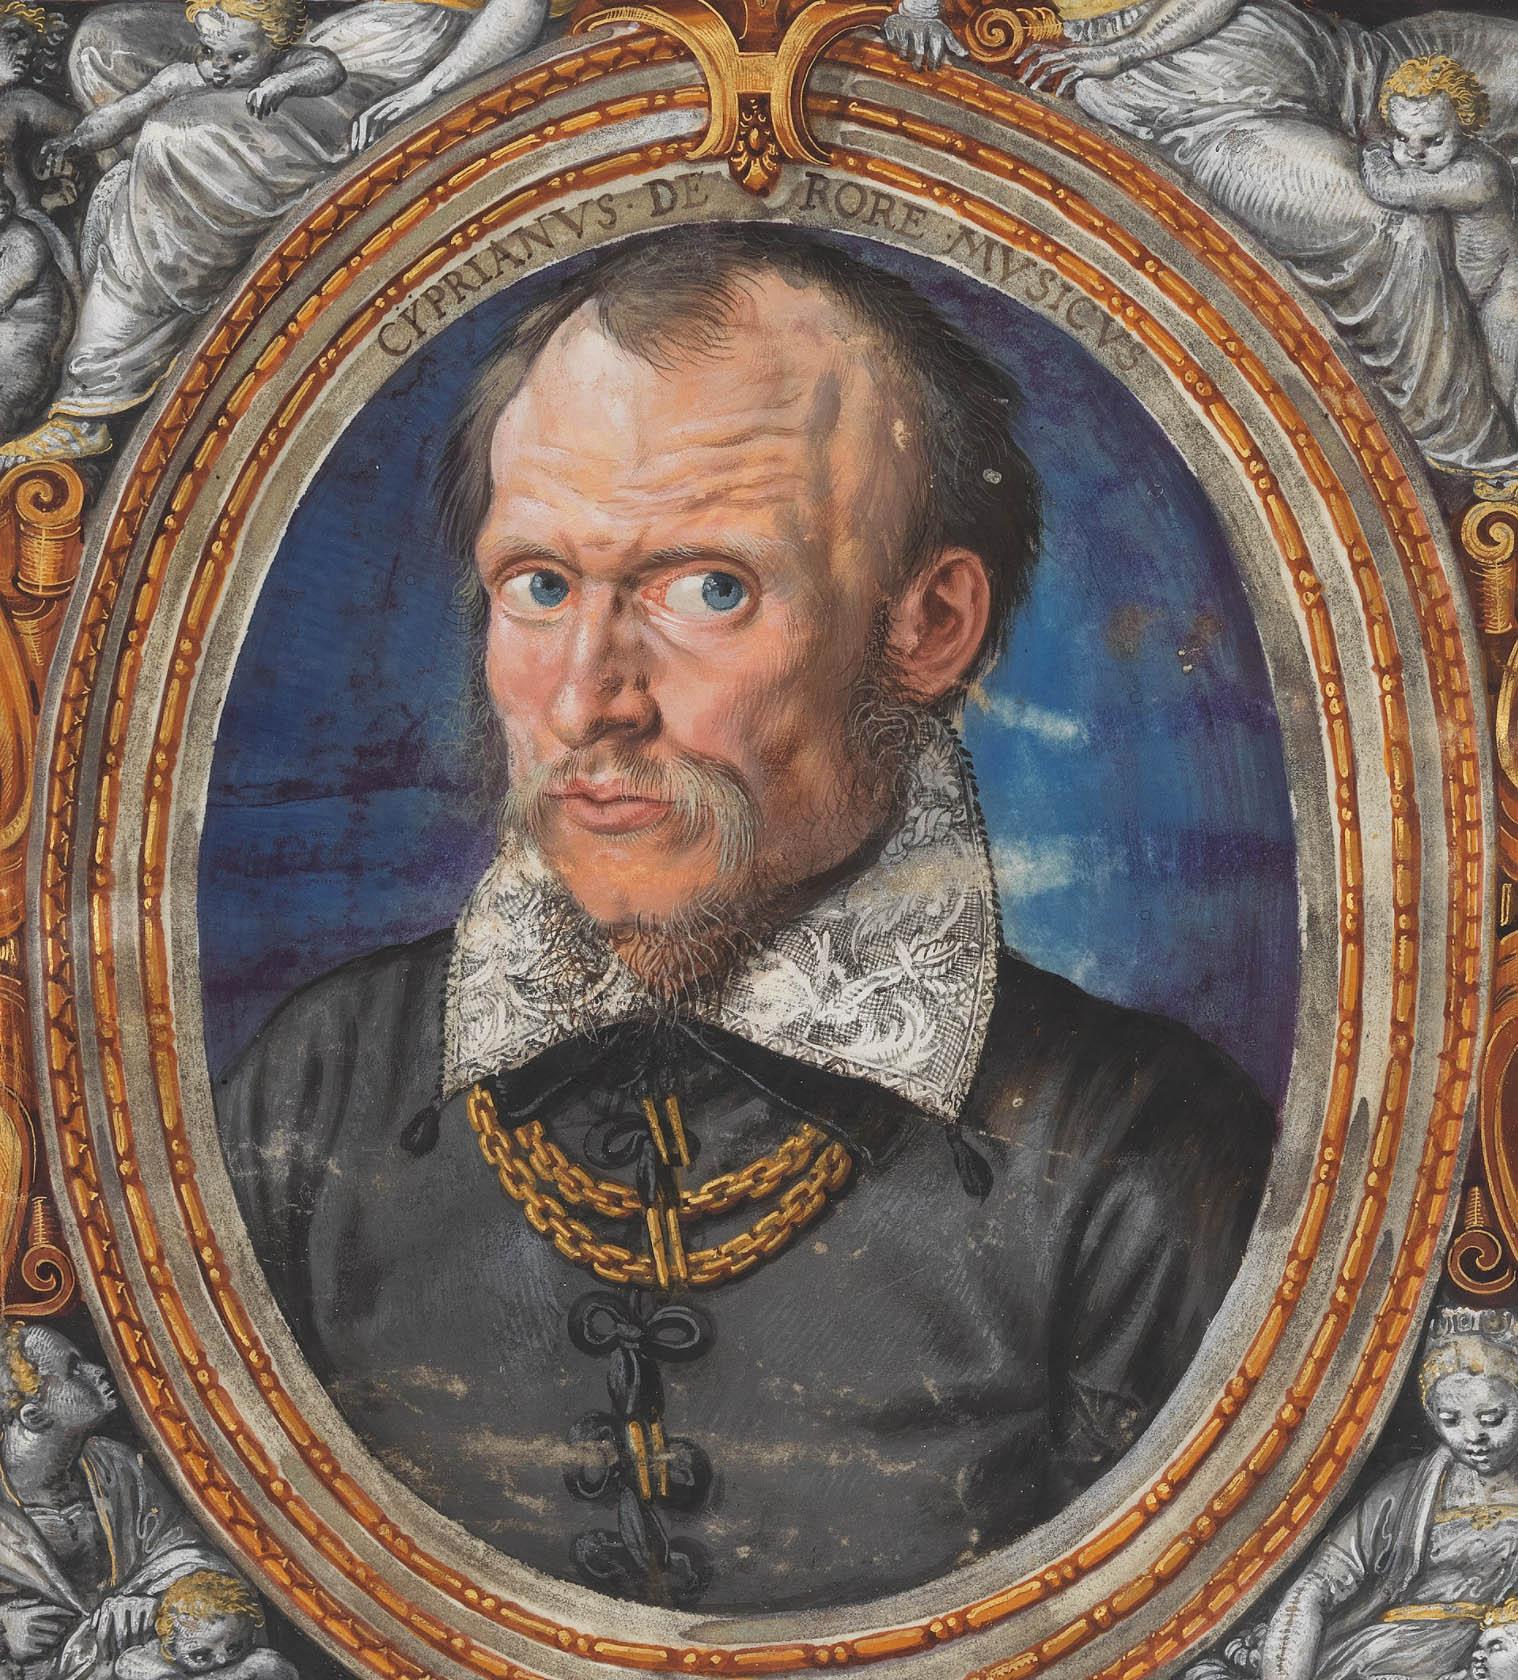 Cipriano de Rore par Hans Miuelich -1558 - Ecole de Venise